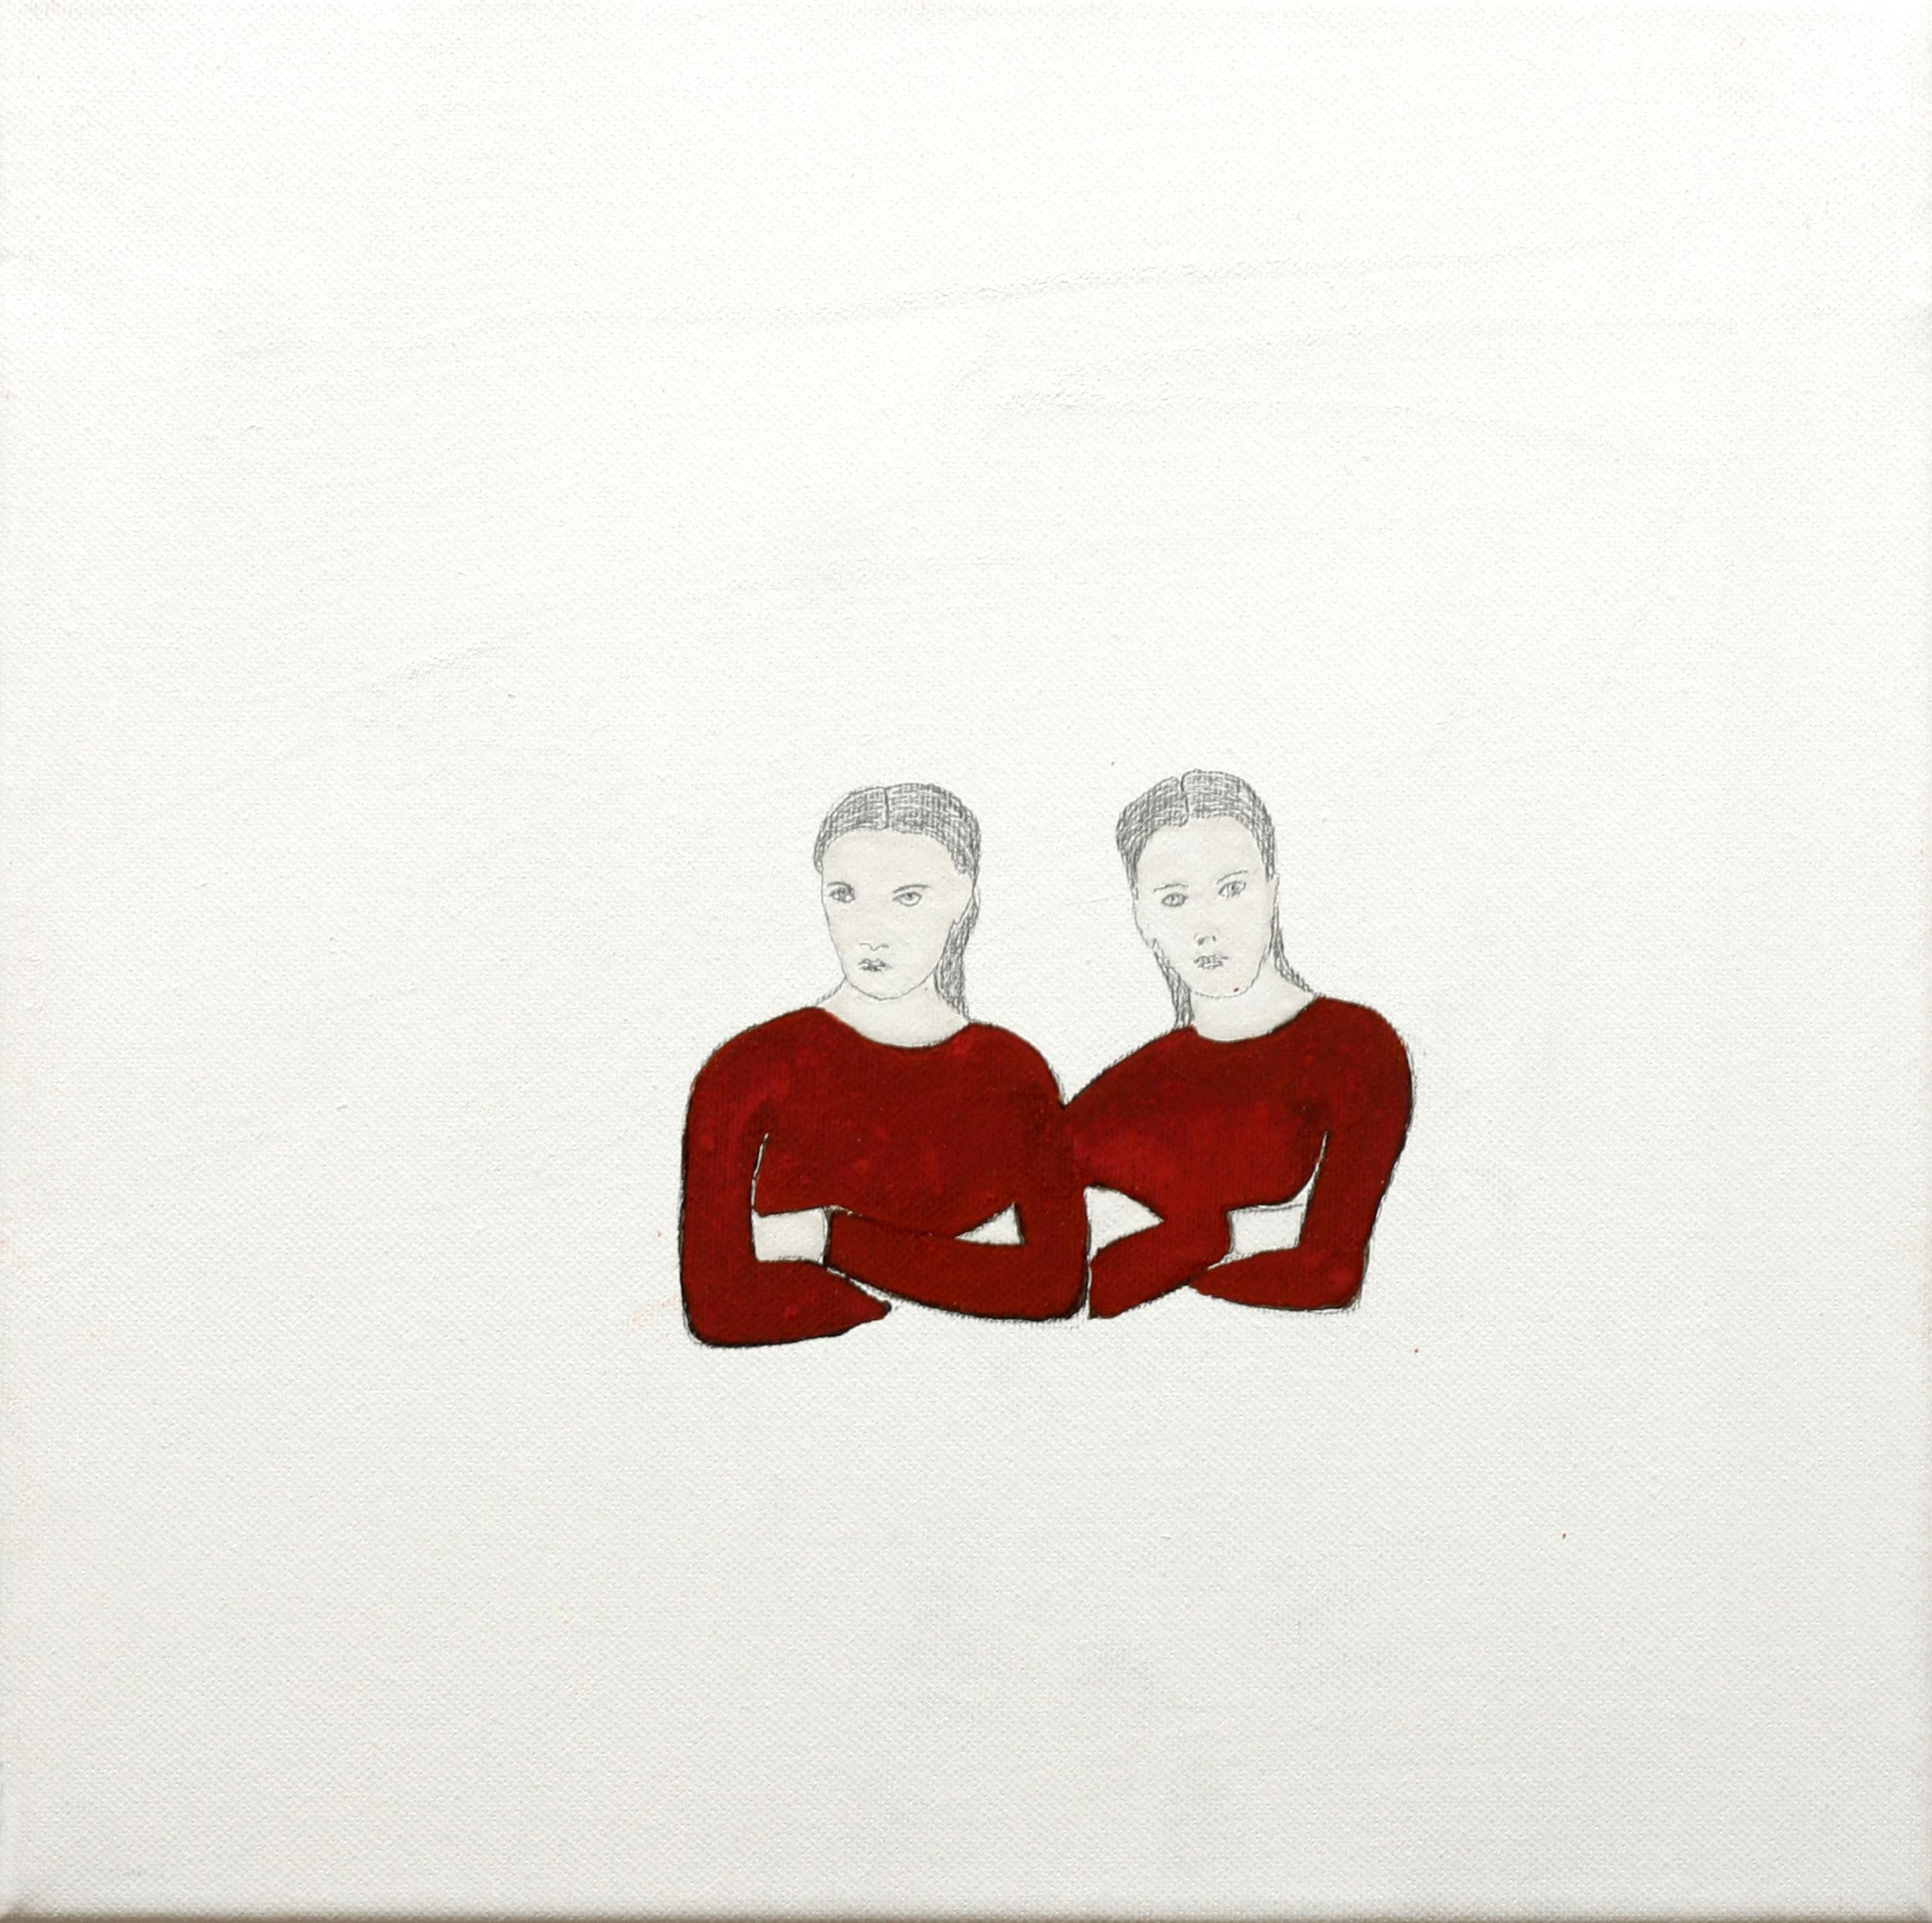 Dos bustos-Retratos / Two busts-Portraits